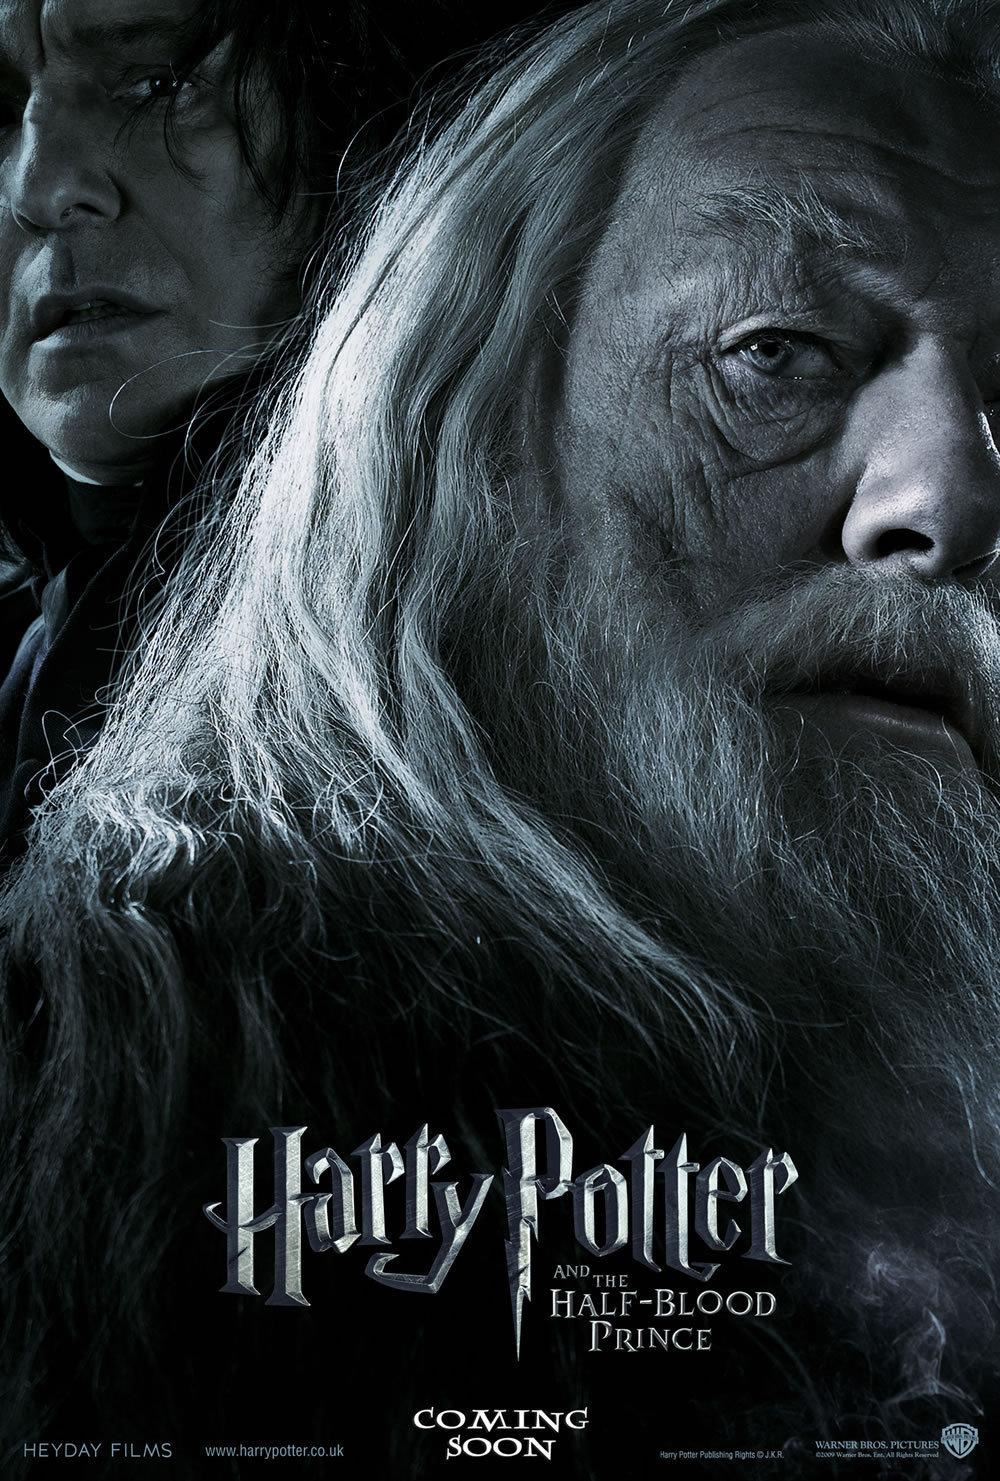 Albus Dumbledore Images Albus Dumbledore Hd Wallpaper And Background